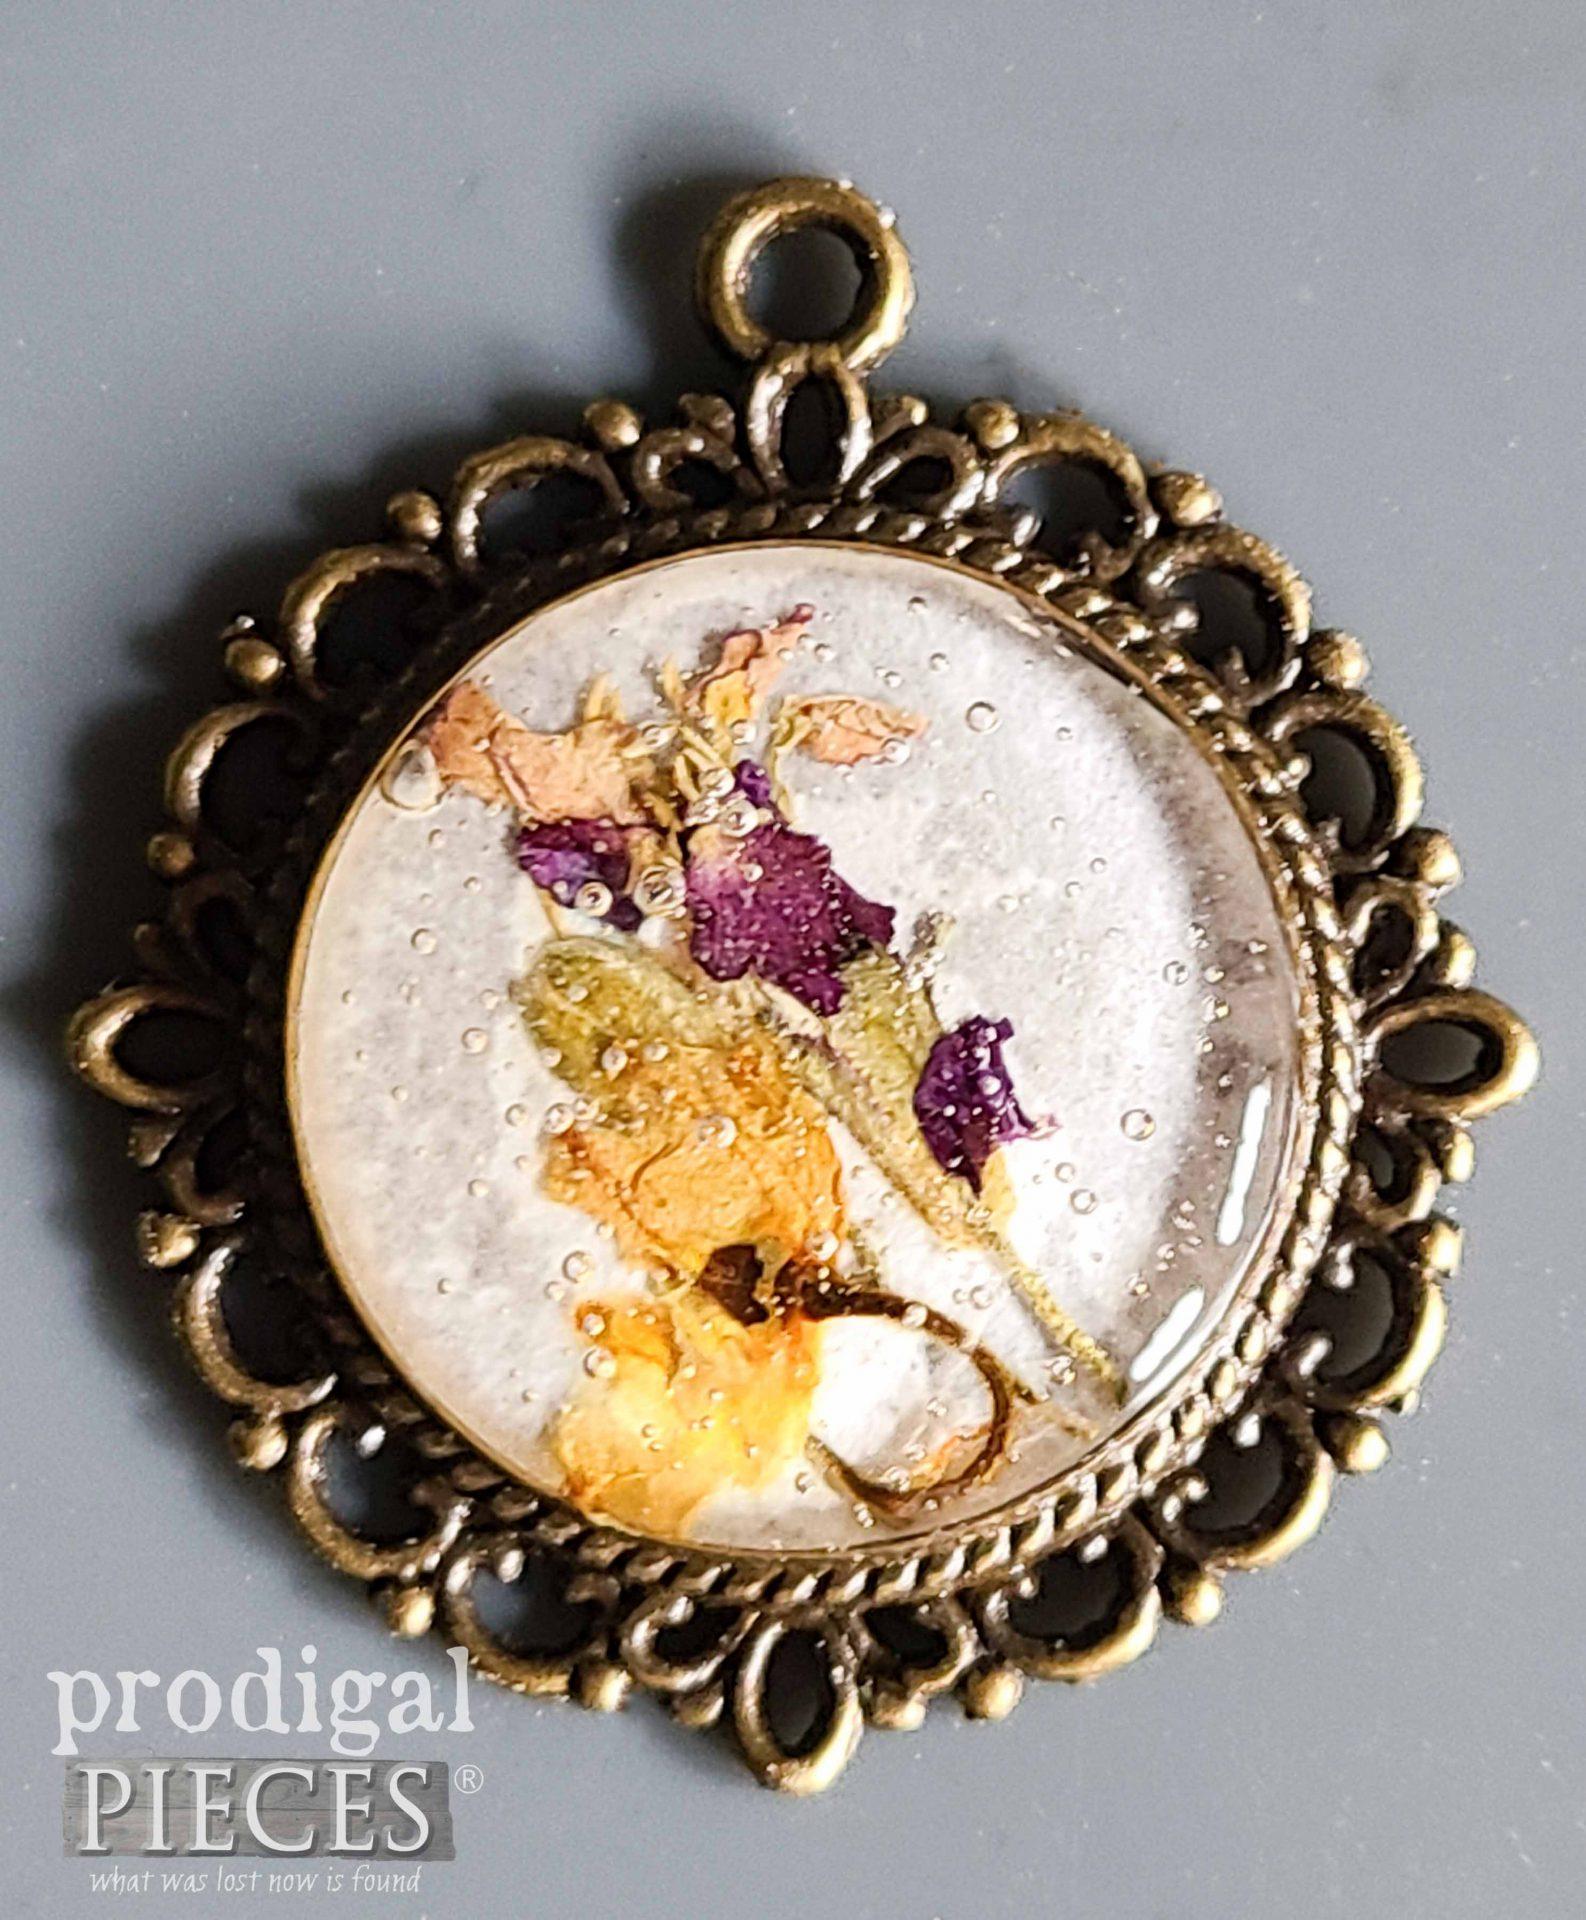 DIY Resin Necklace Pendant with Bubbles   prodigalpieces.com